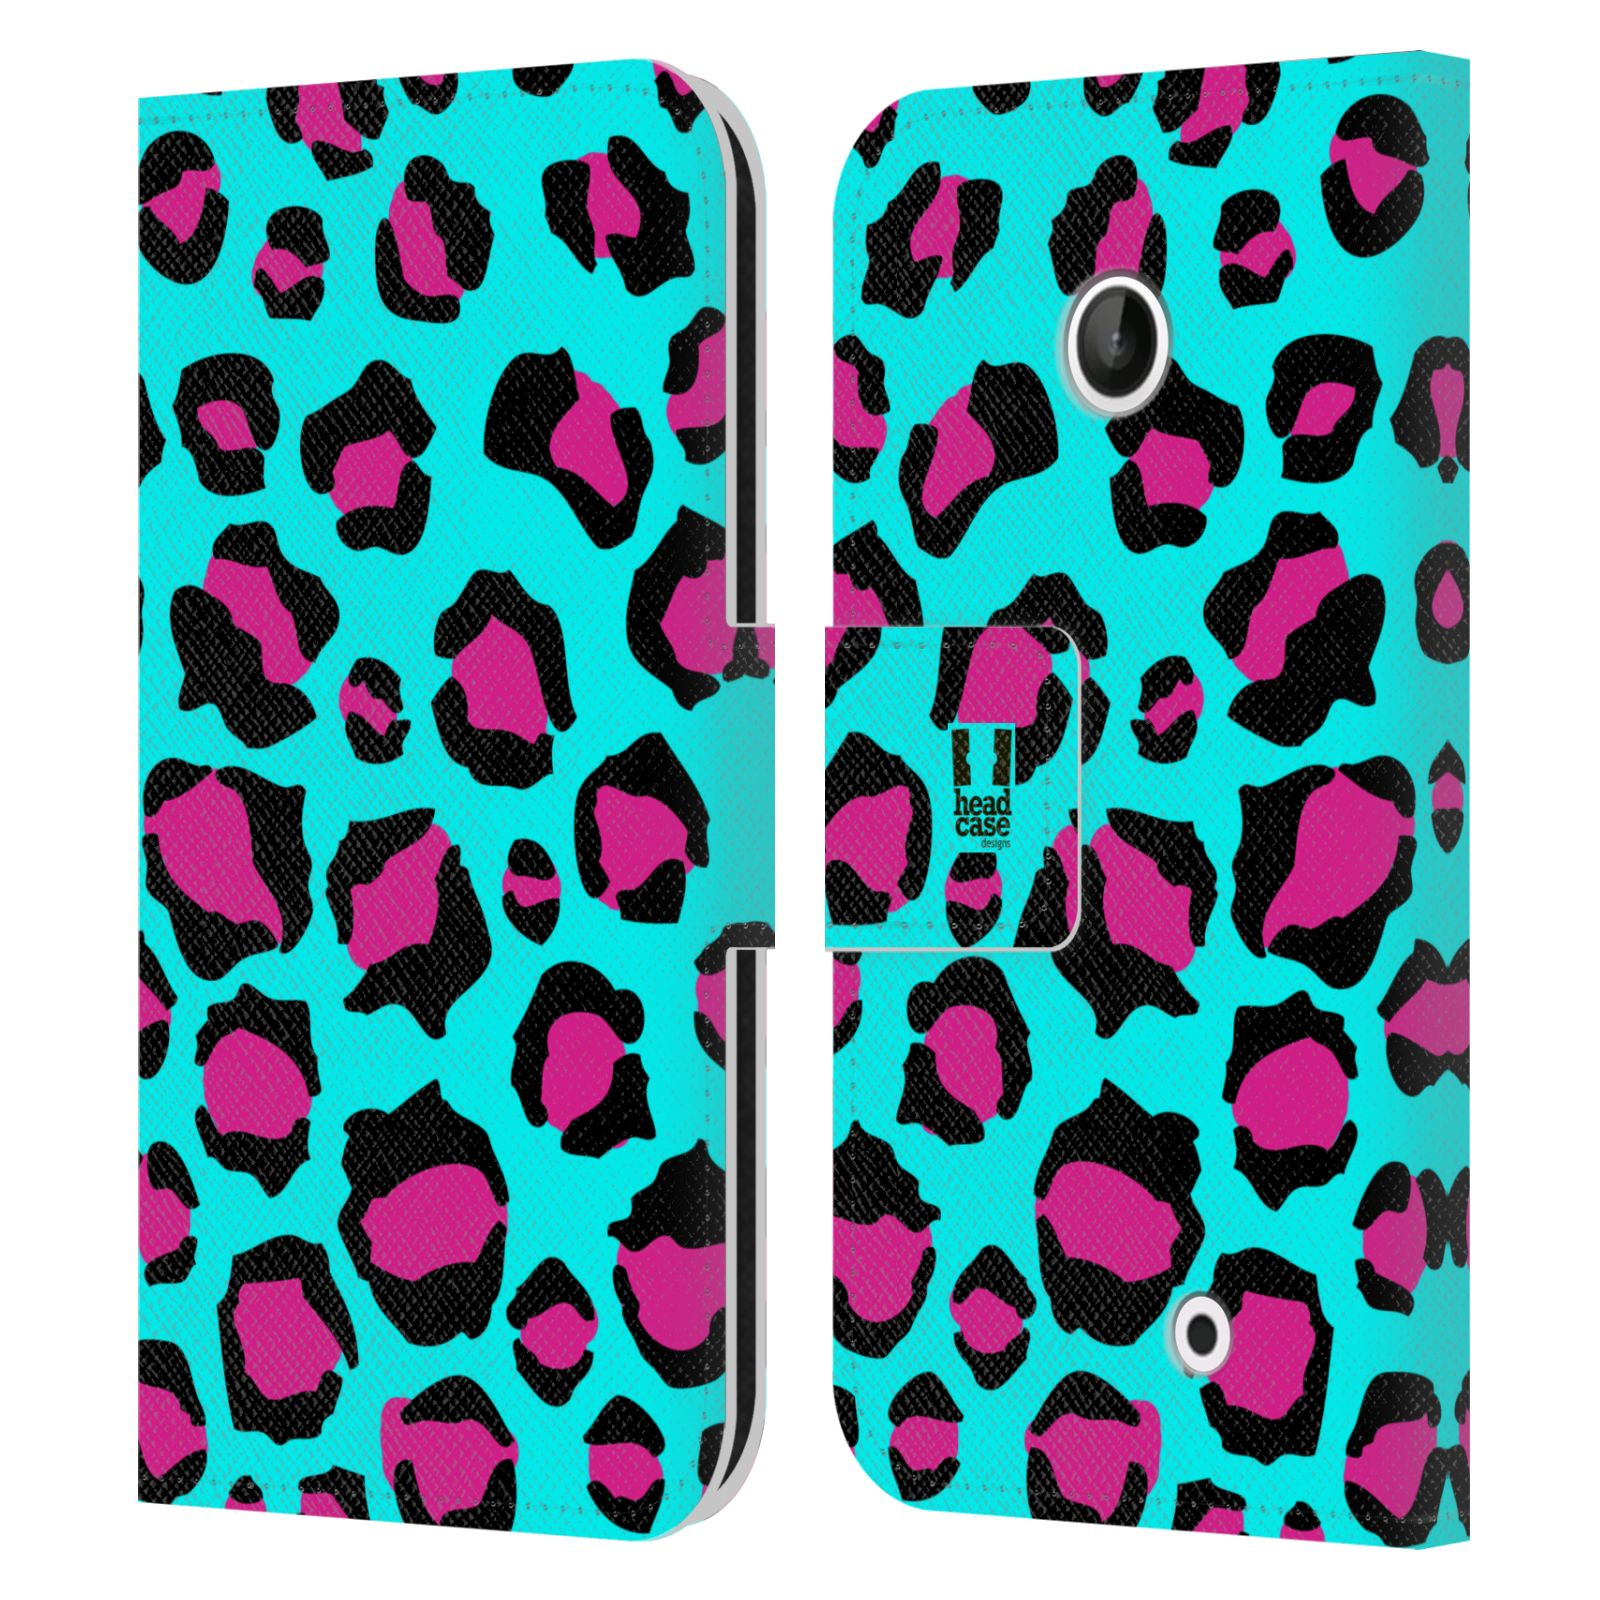 HEAD CASE Flipové pouzdro pro mobil NOKIA LUMIA 630 / LUMIA 630 DUAL Zvířecí barevné vzory tyrkysový leopard